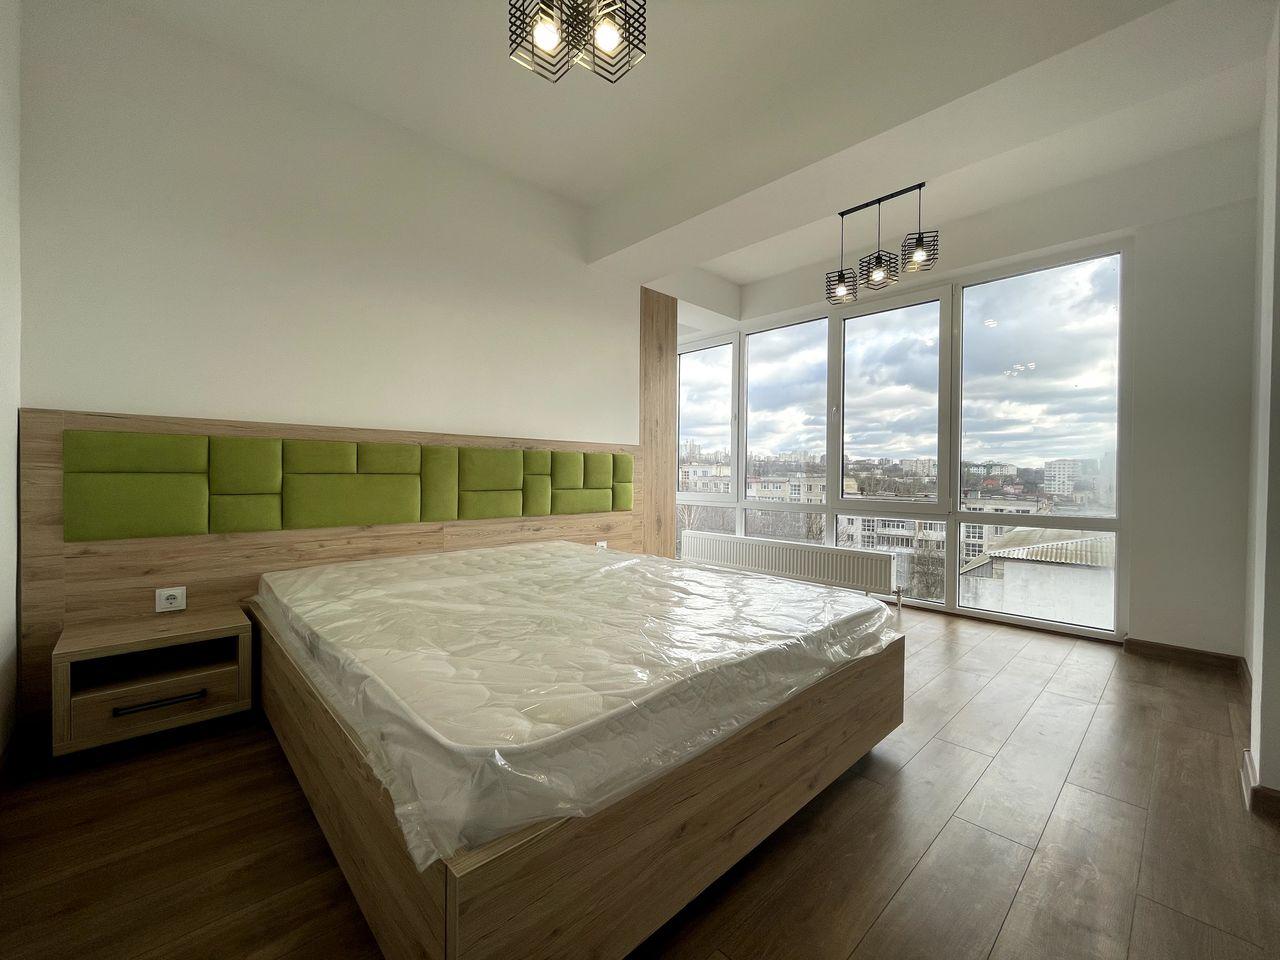 Apartament 2 camere + living, Posta Veche